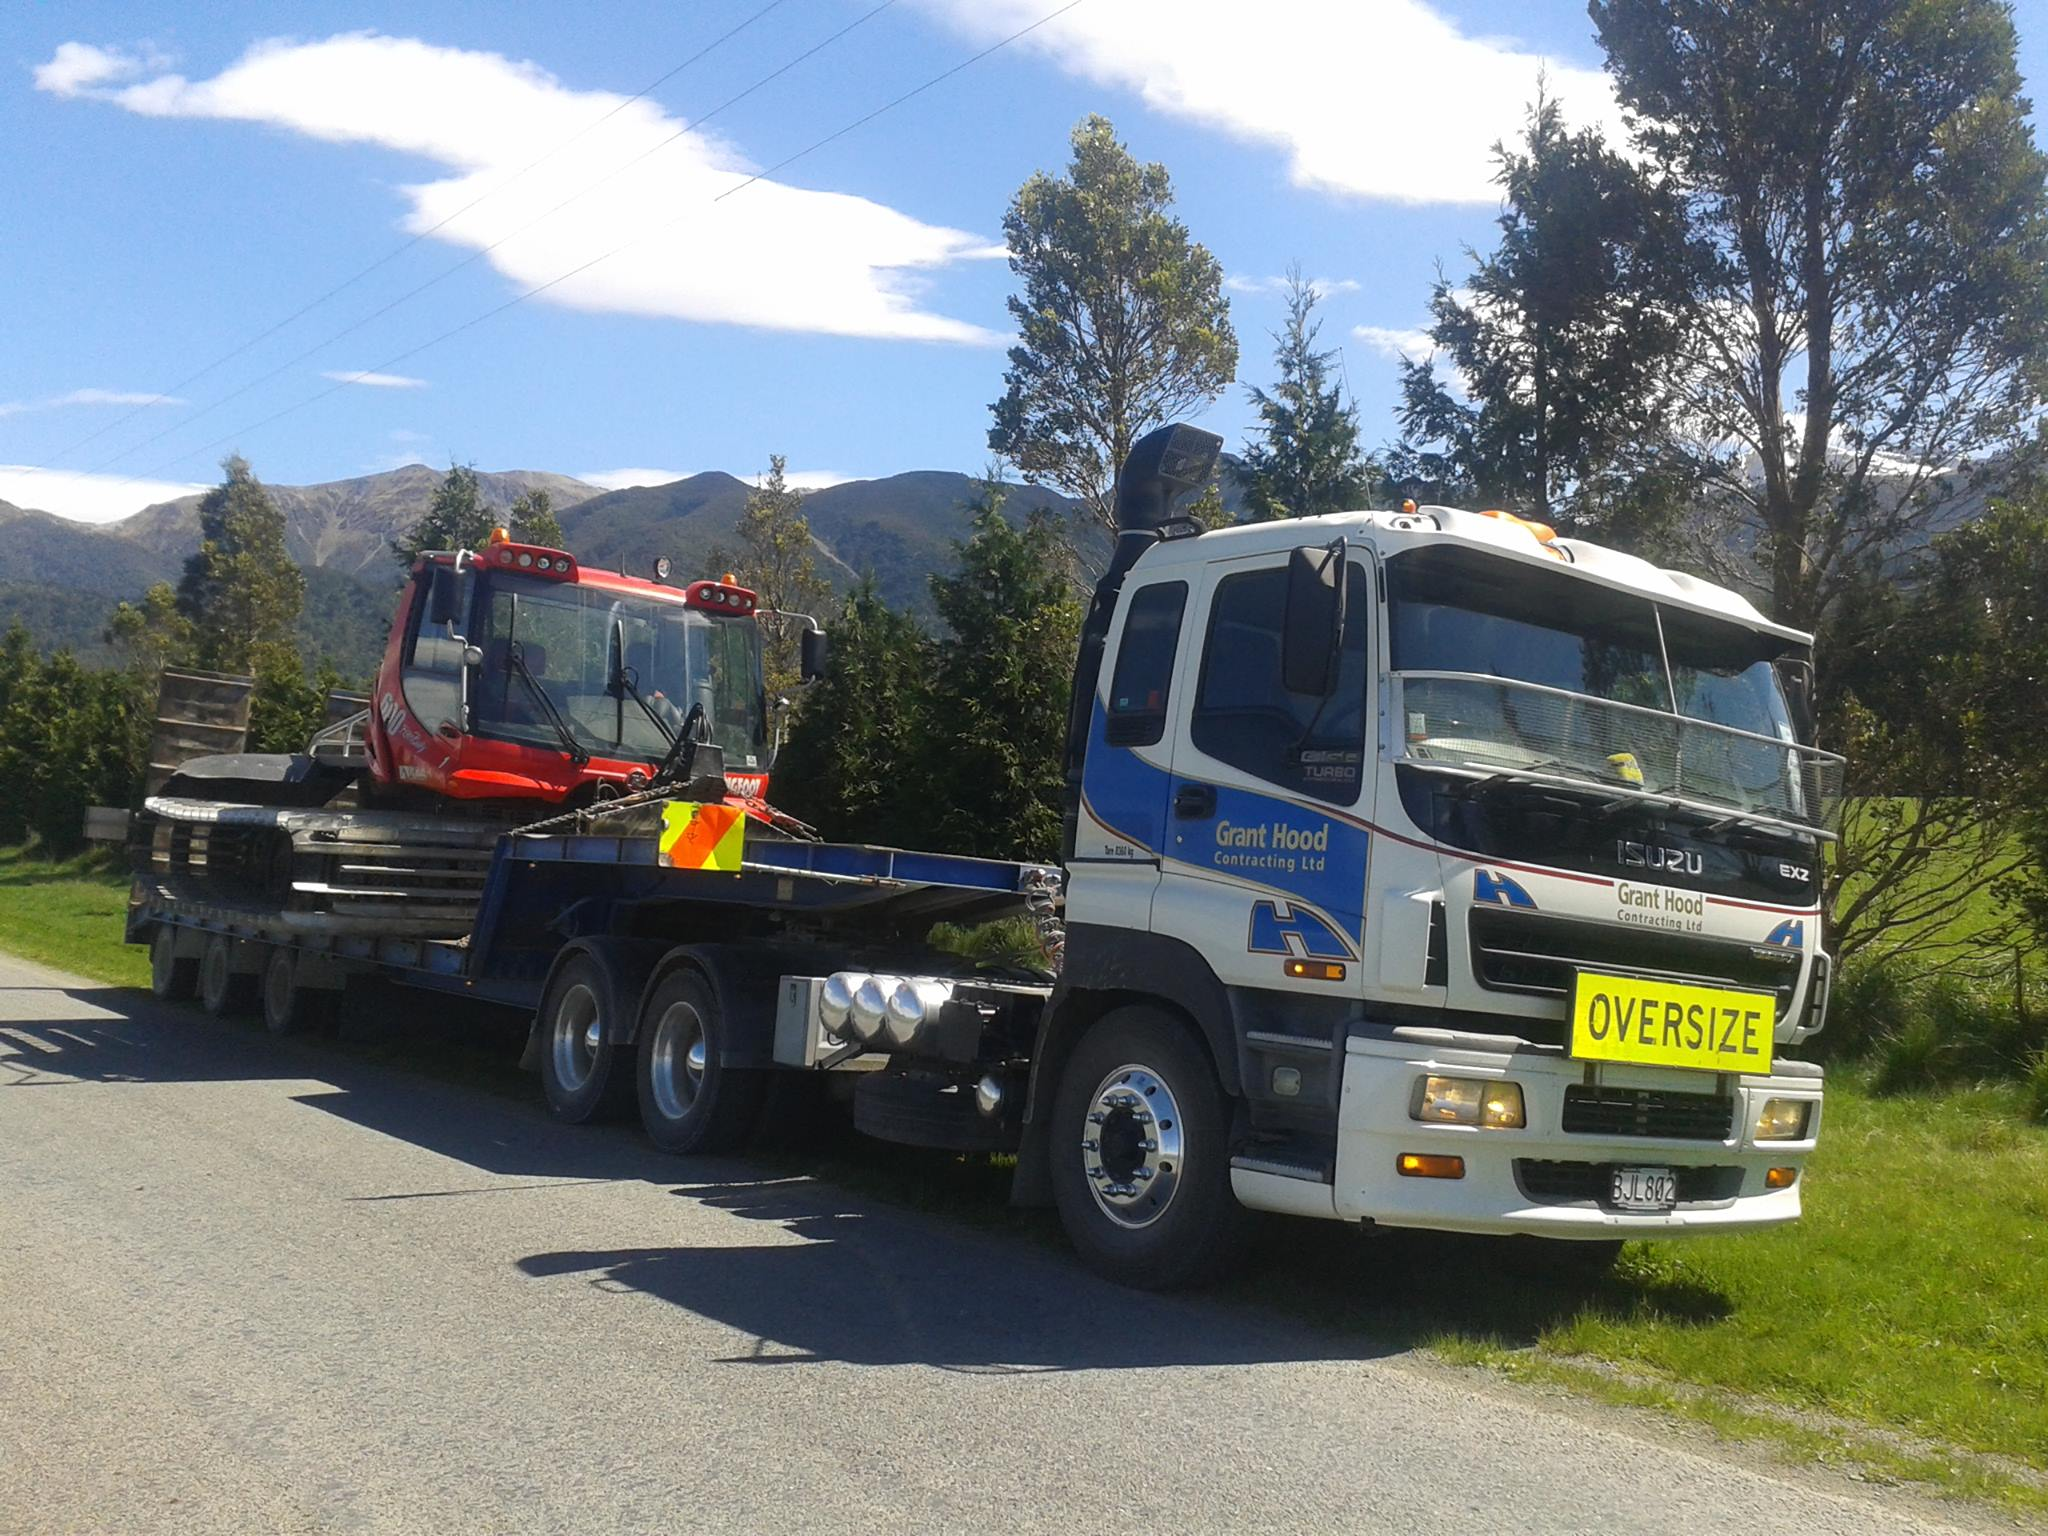 Granthoodcontracting-transport5